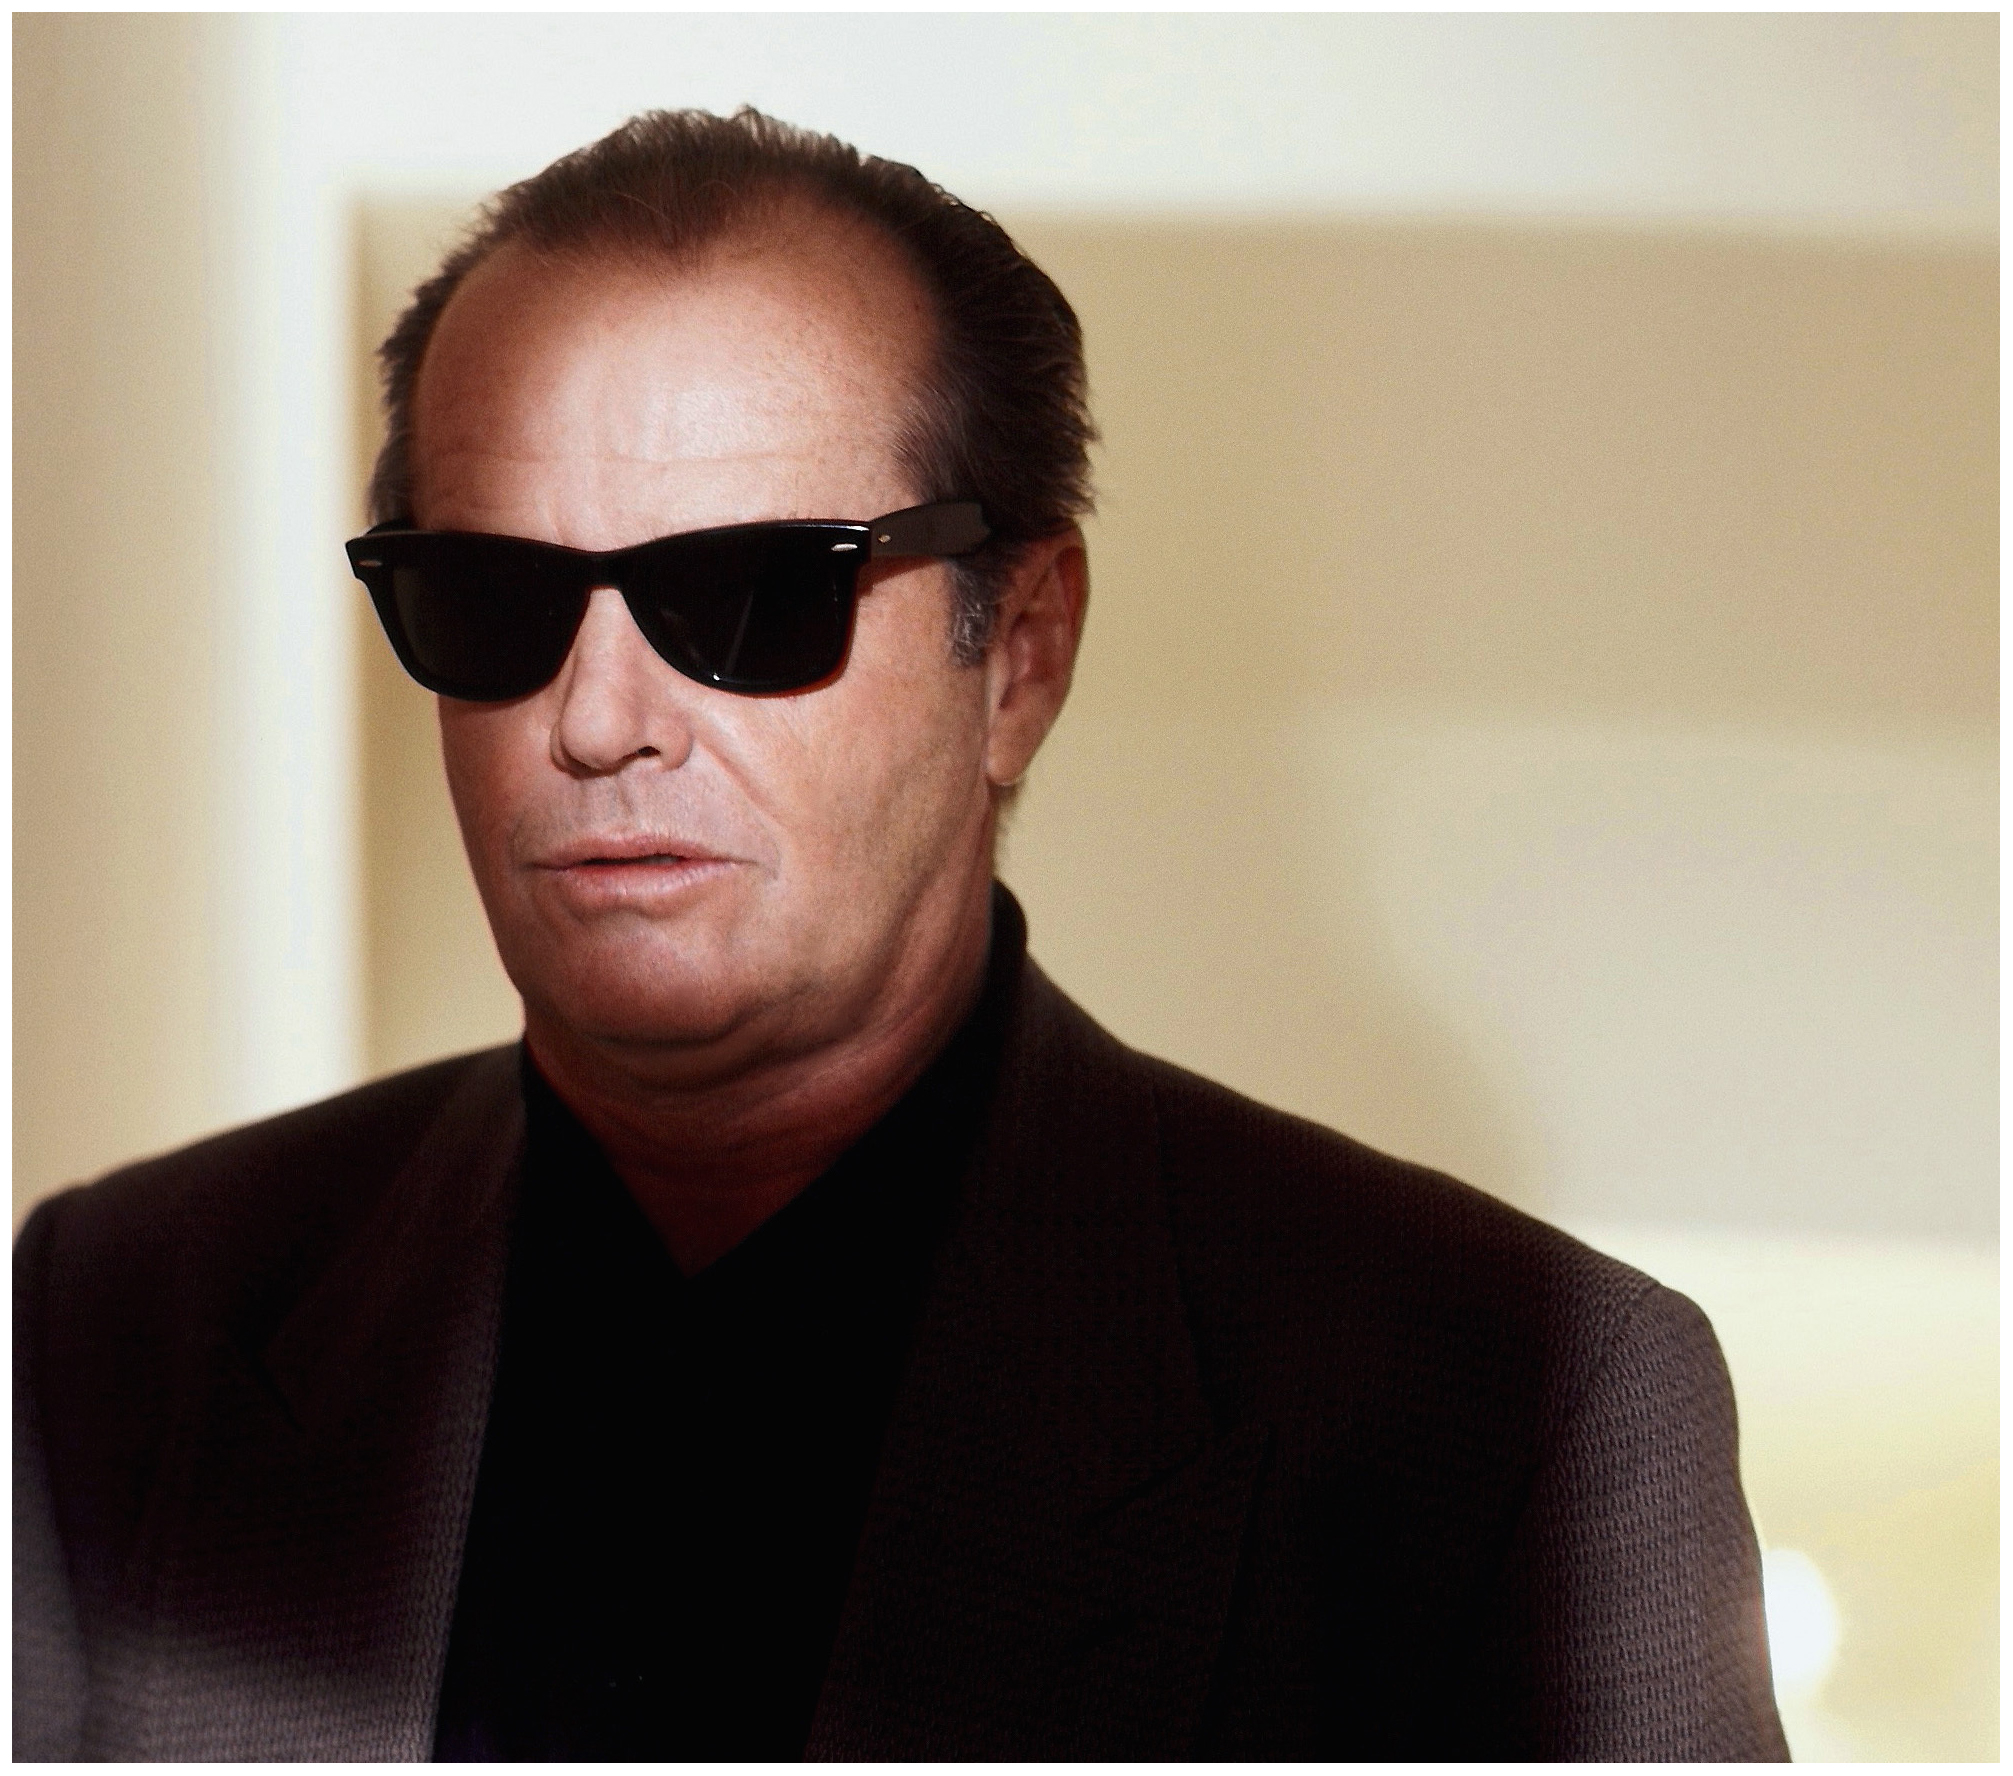 Jack Nicholson Sunglasses Series 1993 by Michael Tighe | © Pleasurephoto